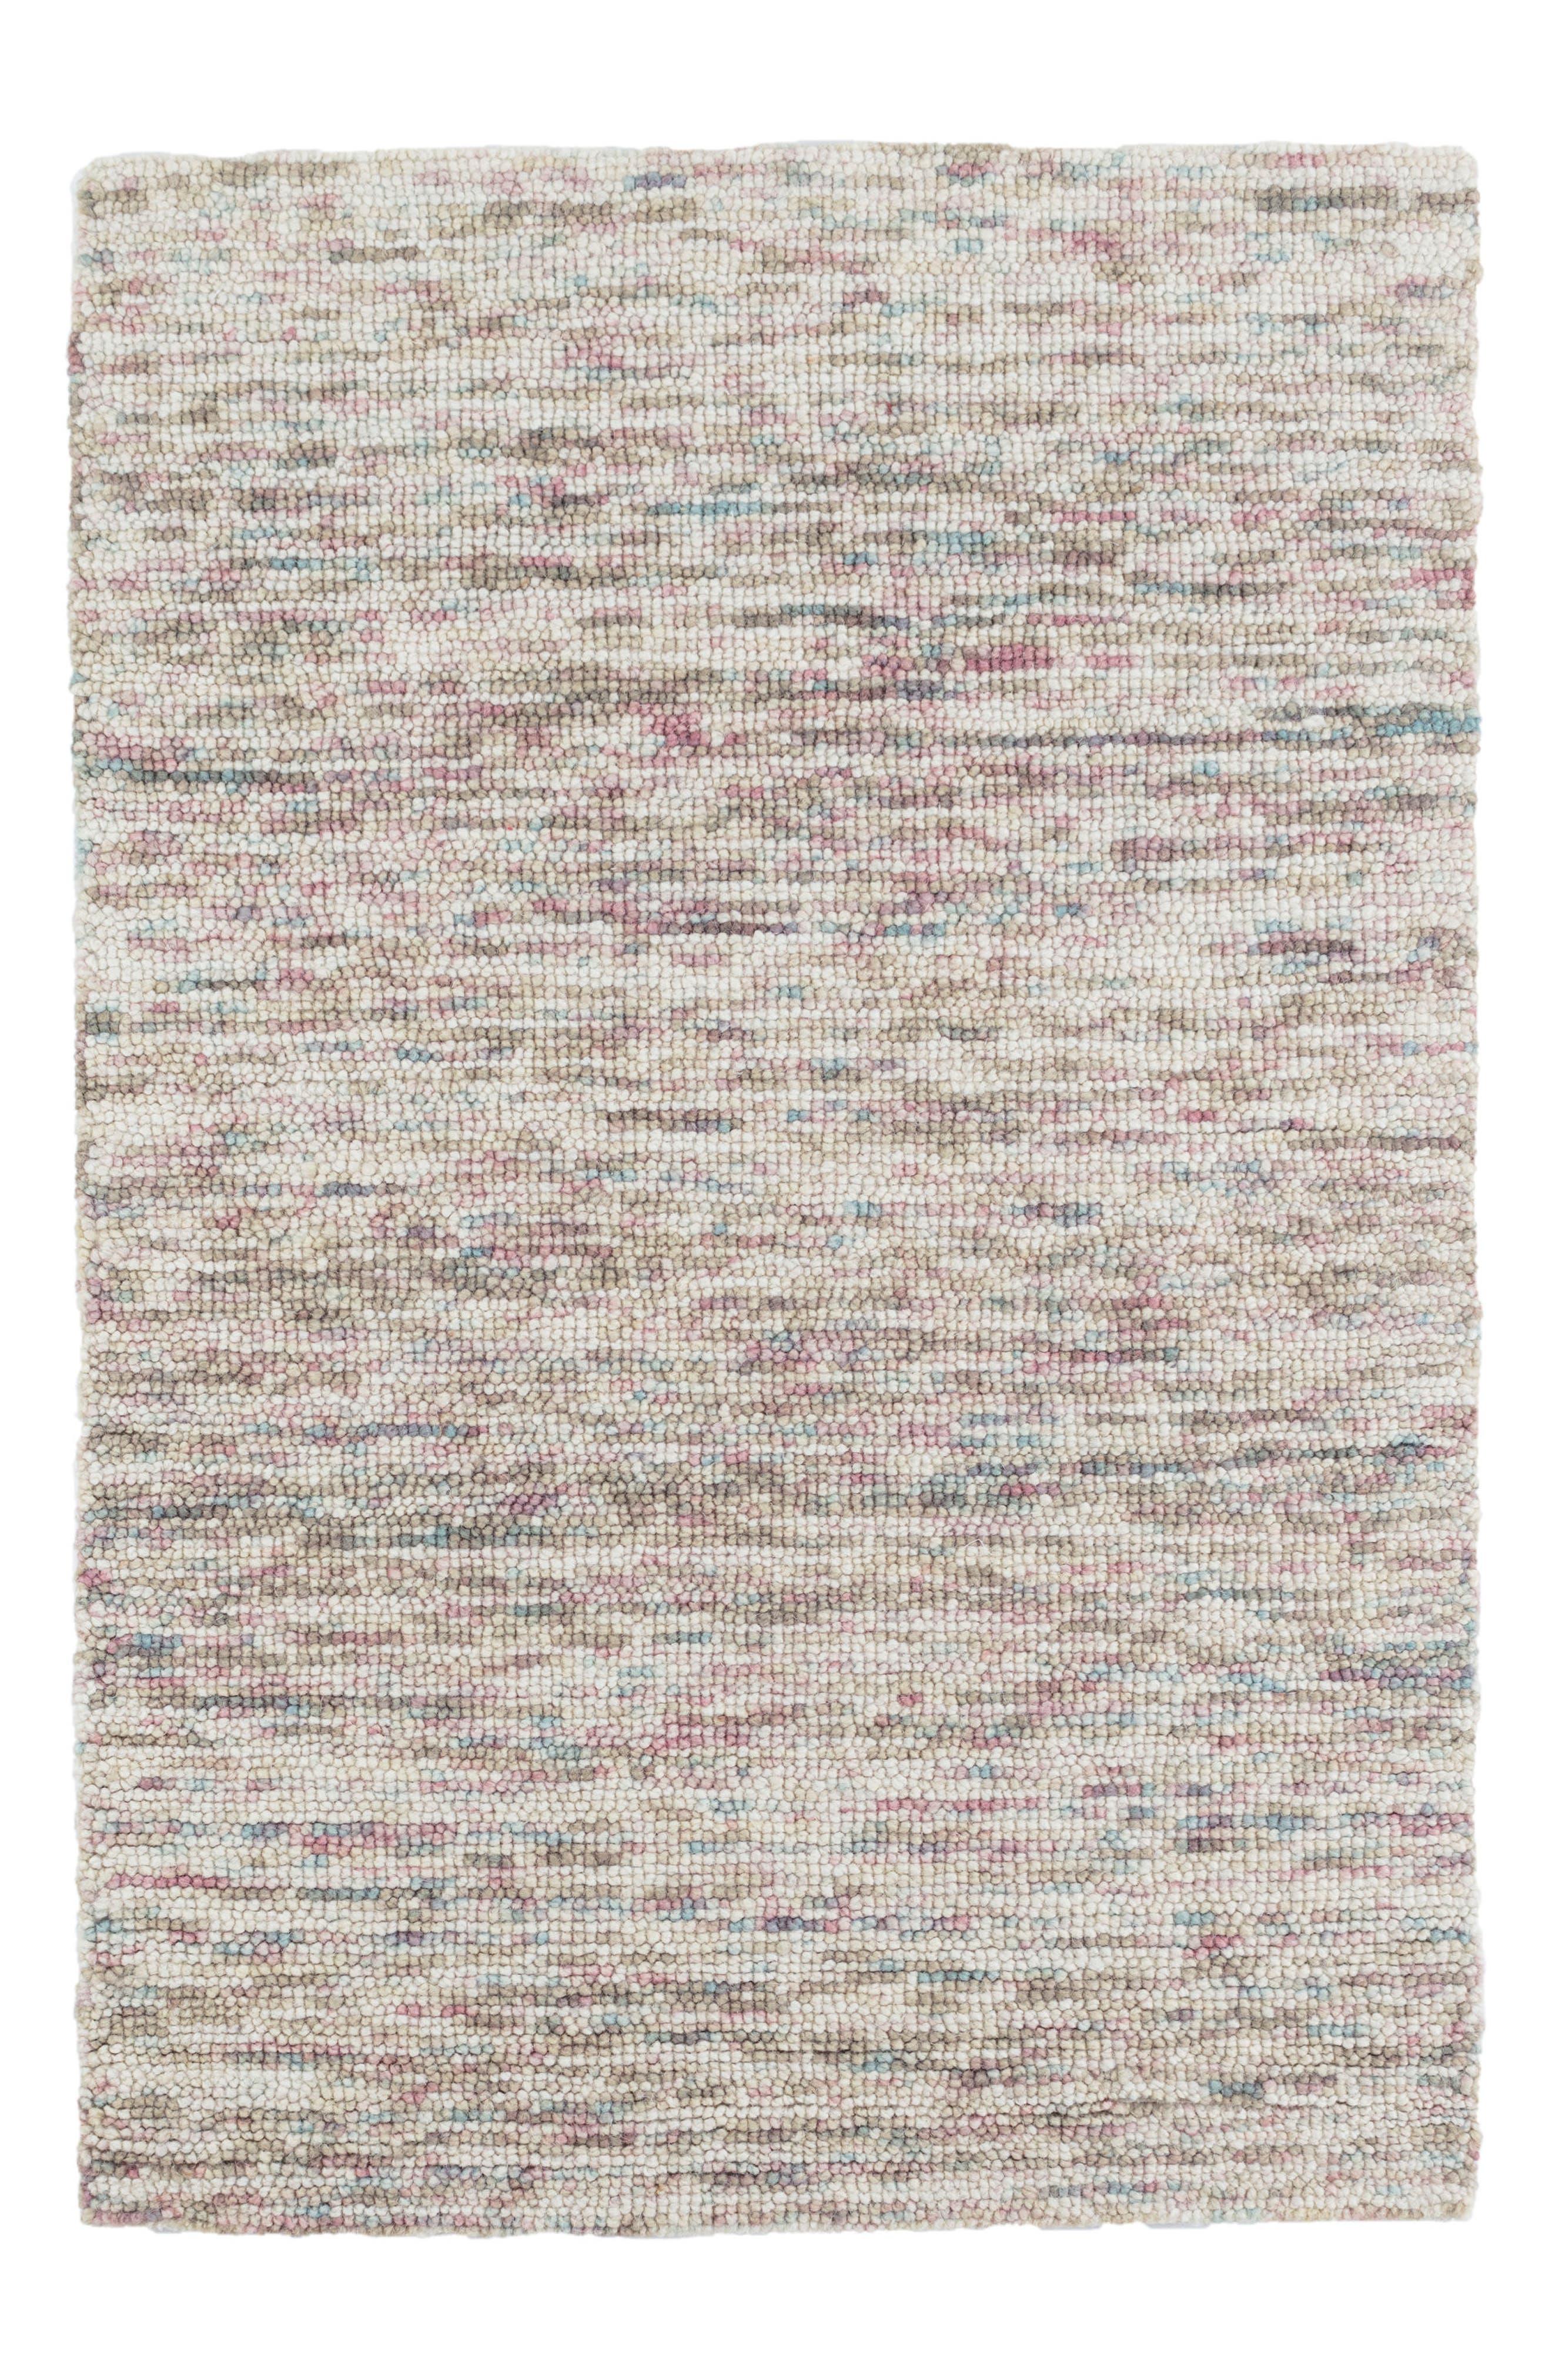 Artisanal Hooked Wool Rug,                         Main,                         color, Blue